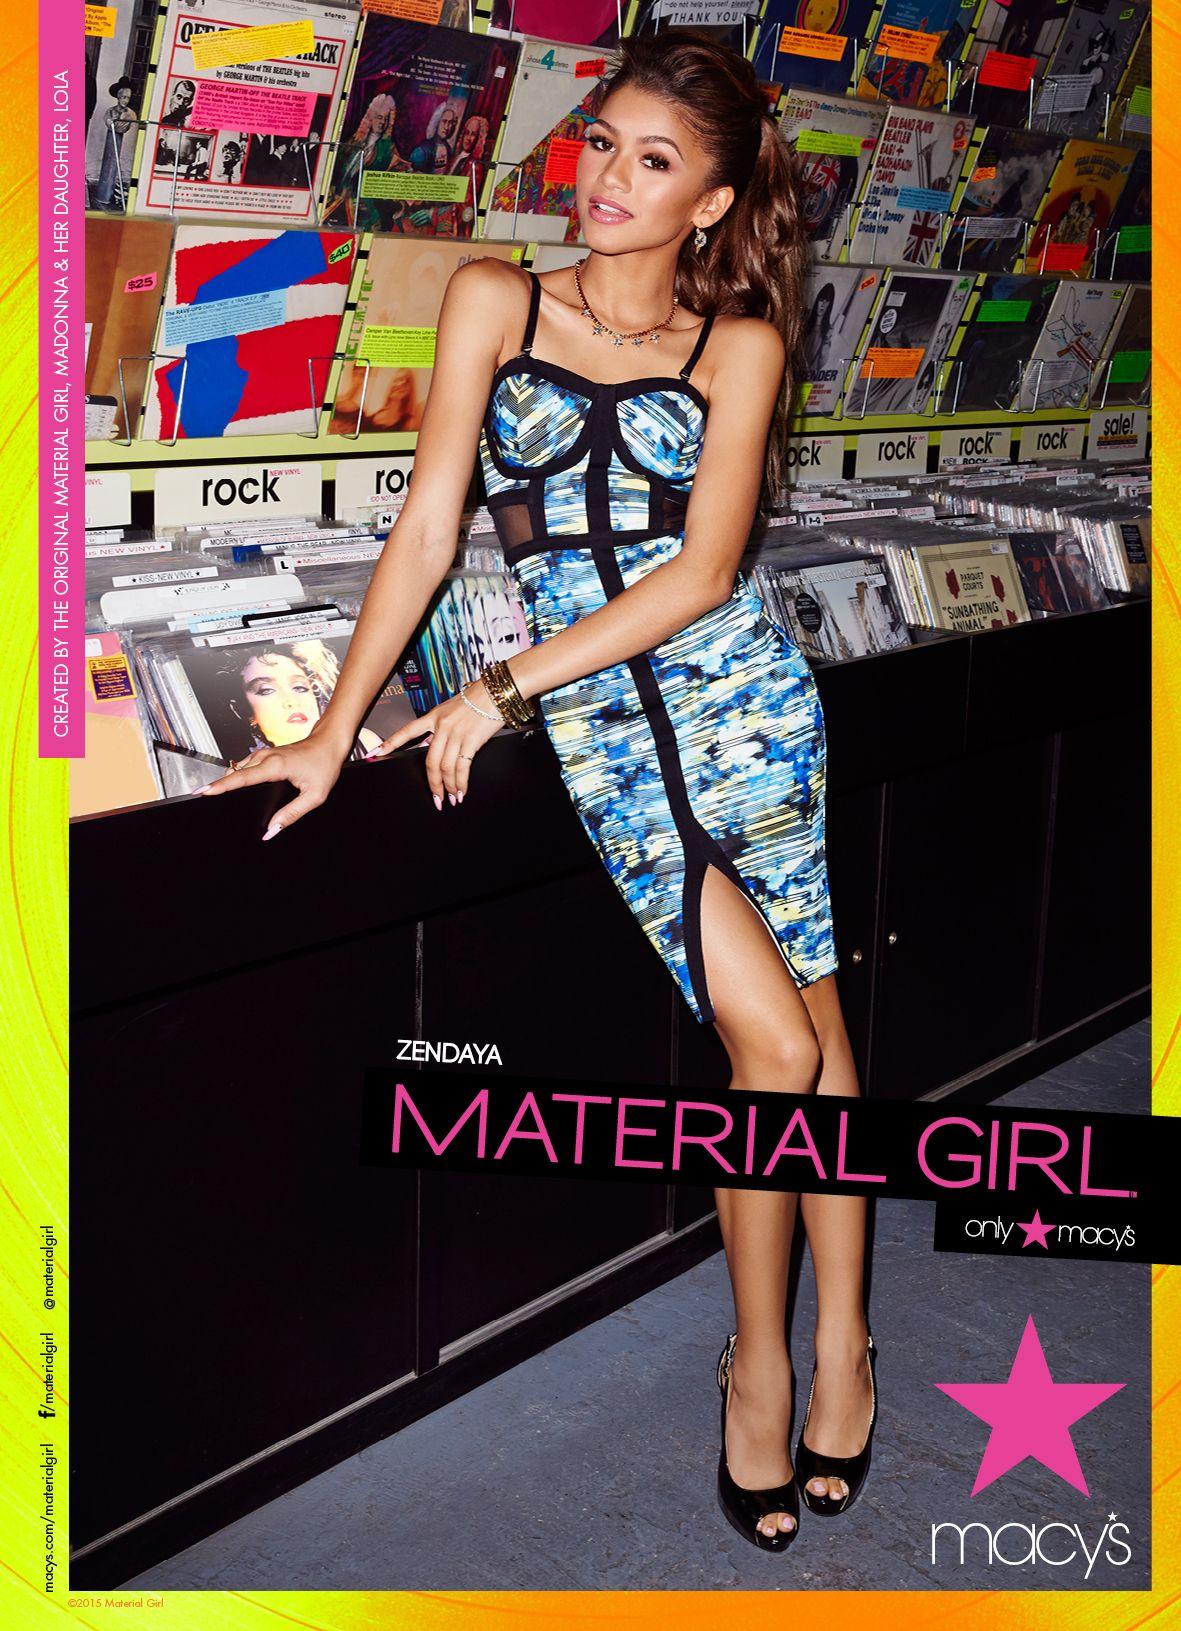 Zendaya Is Back As Madonna S Material Girl For 2015 Zendaya